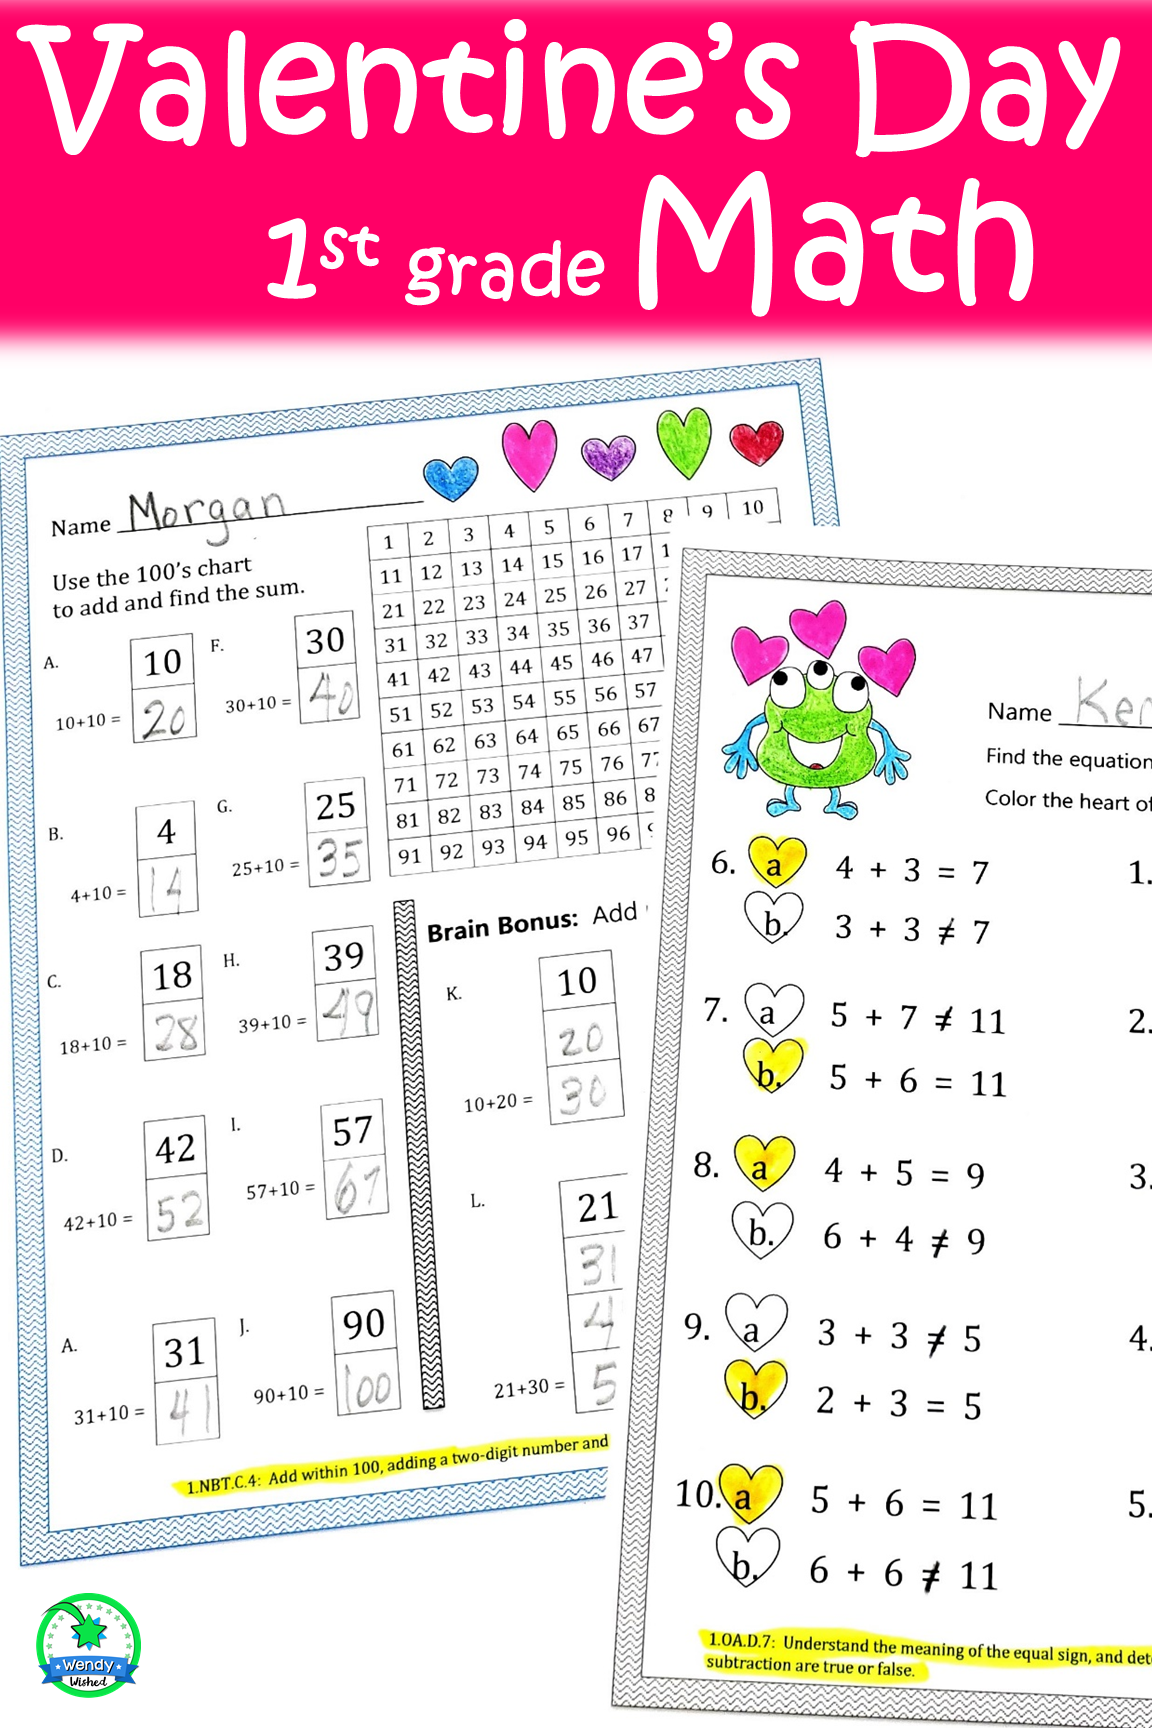 Valentine's Day Math Worksheets for 1st Grade   Math [ 1728 x 1152 Pixel ]